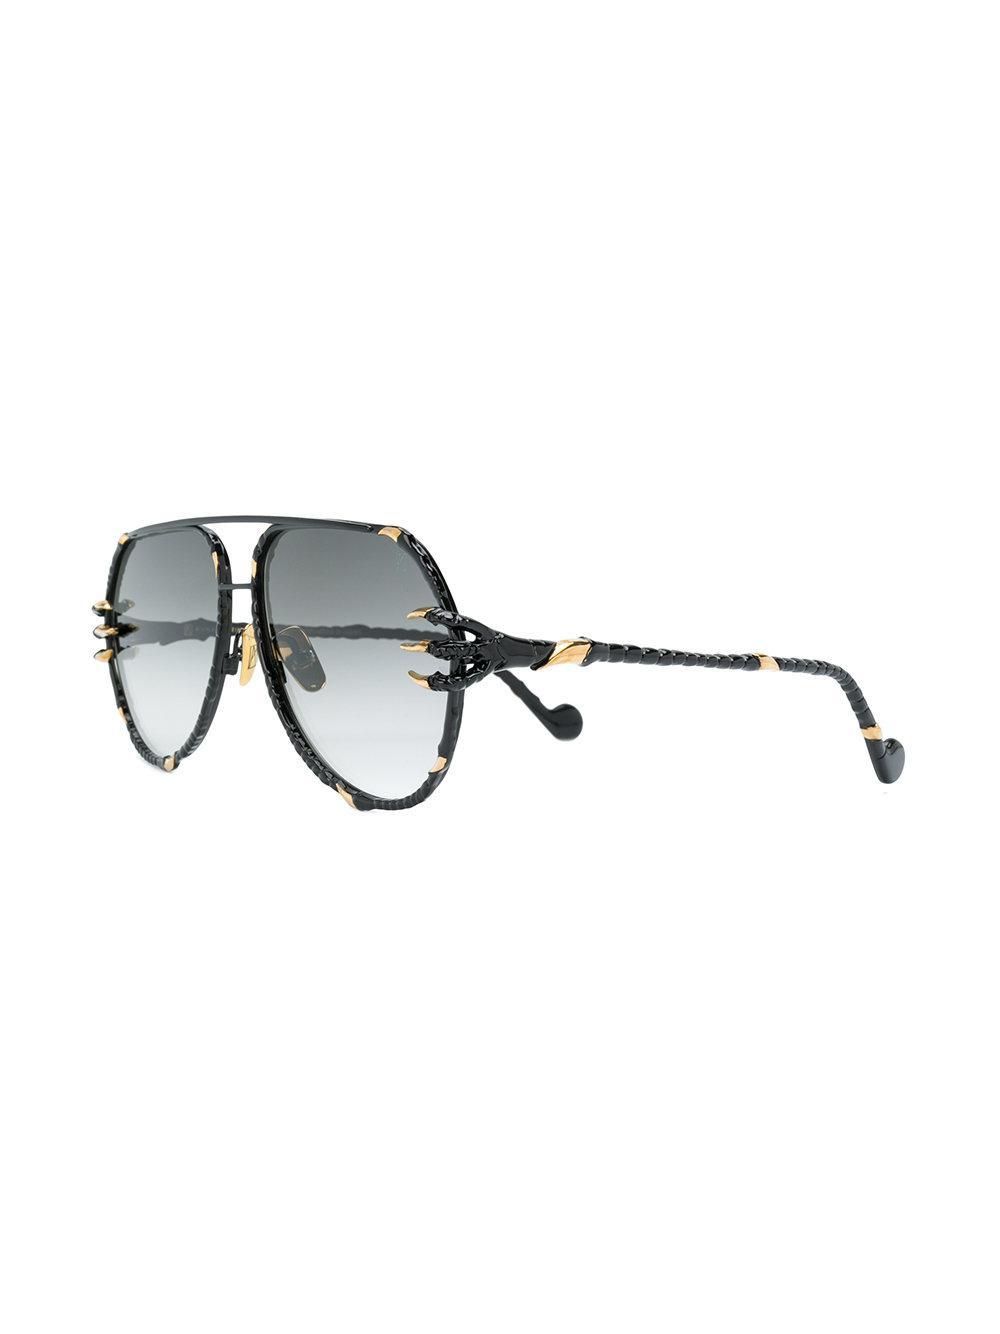 7b81c03385c Anna Karin Karlsson The Claw Pilot Sunglasses in Black - Lyst